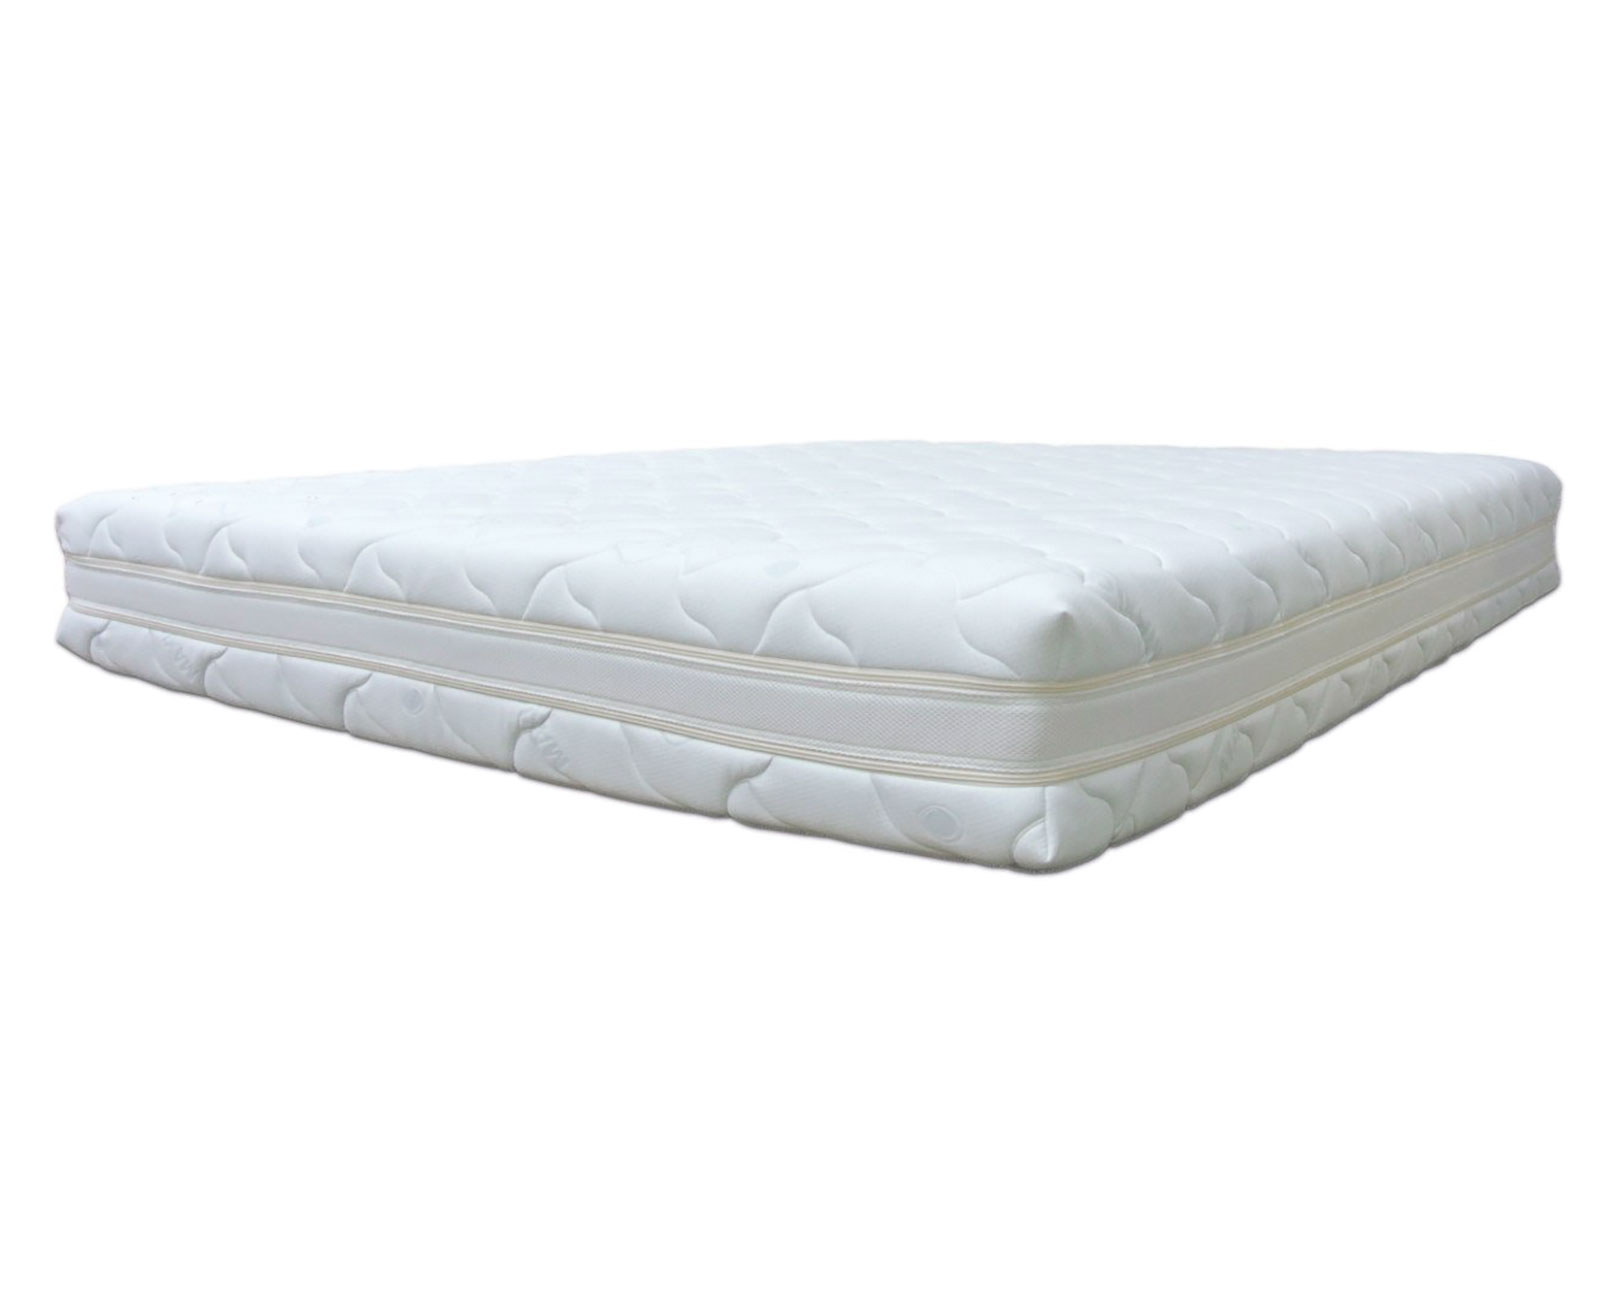 Memory supreme mattress newformsdesign memory foam mattresses newformsdesign - Materasso memory ikea opinioni ...